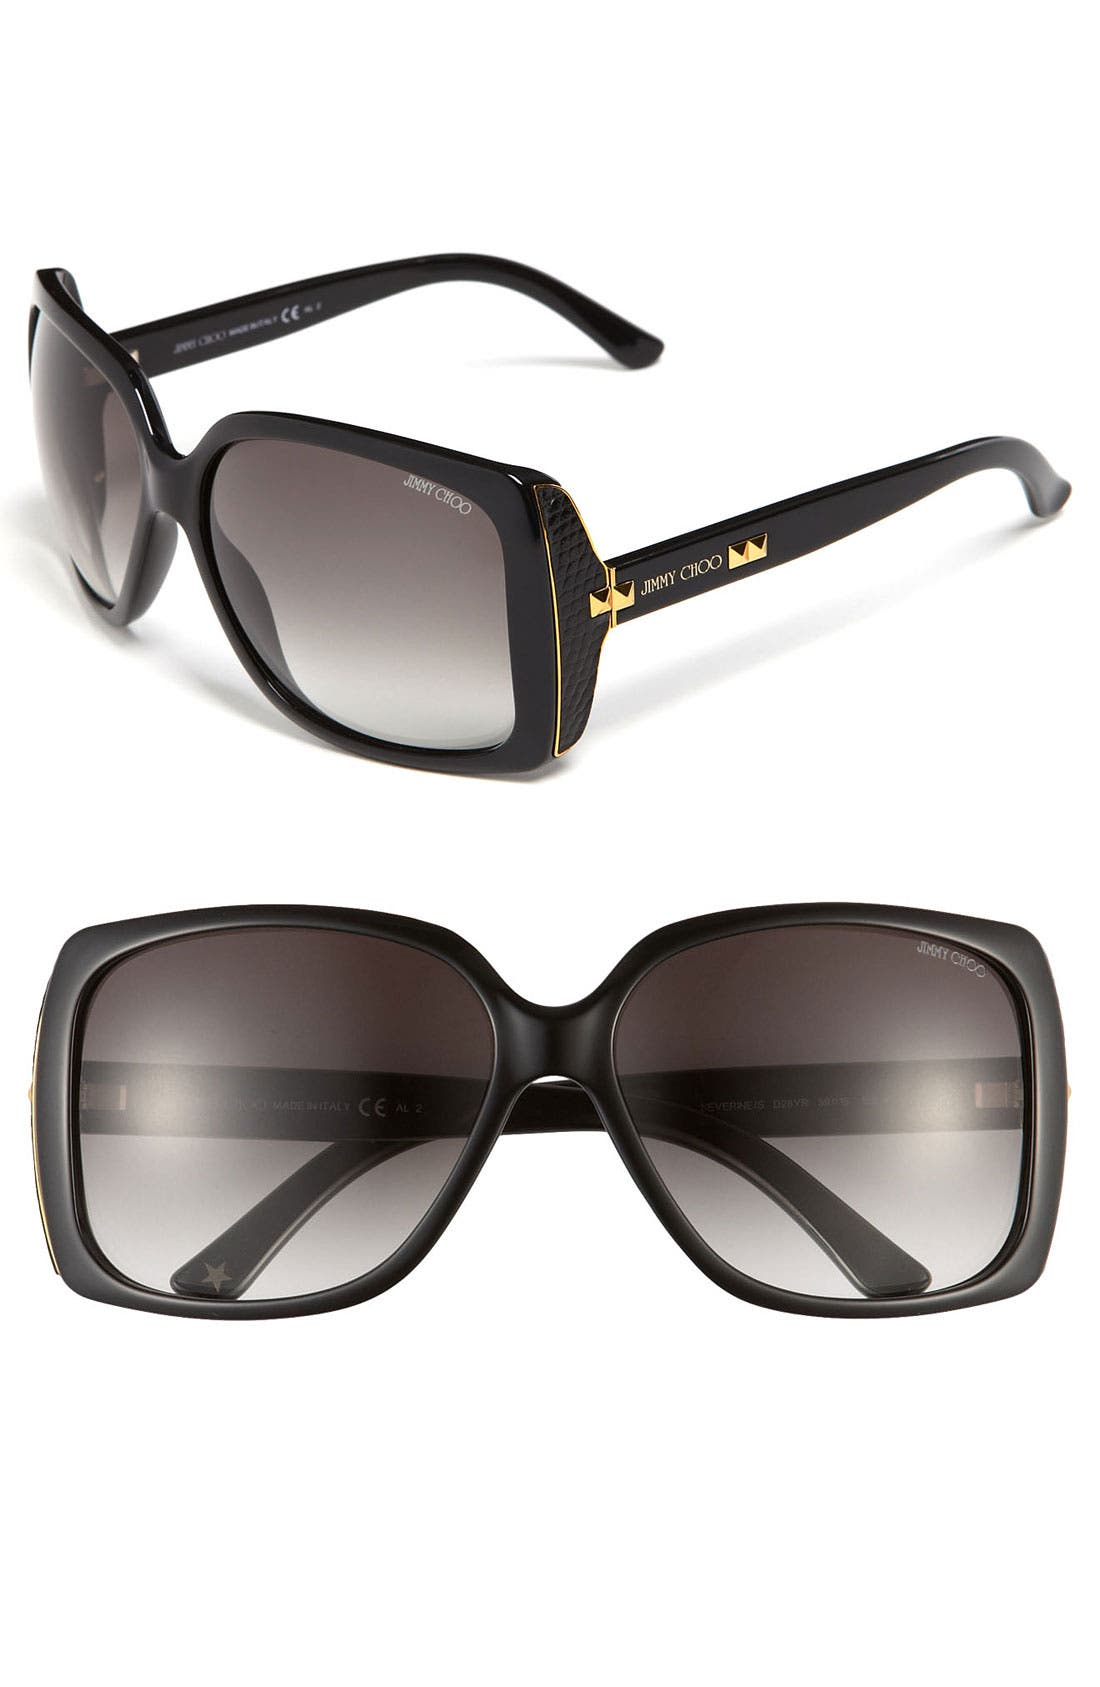 Main Image - Jimmy Choo 'Severine' Classic Sunglasses